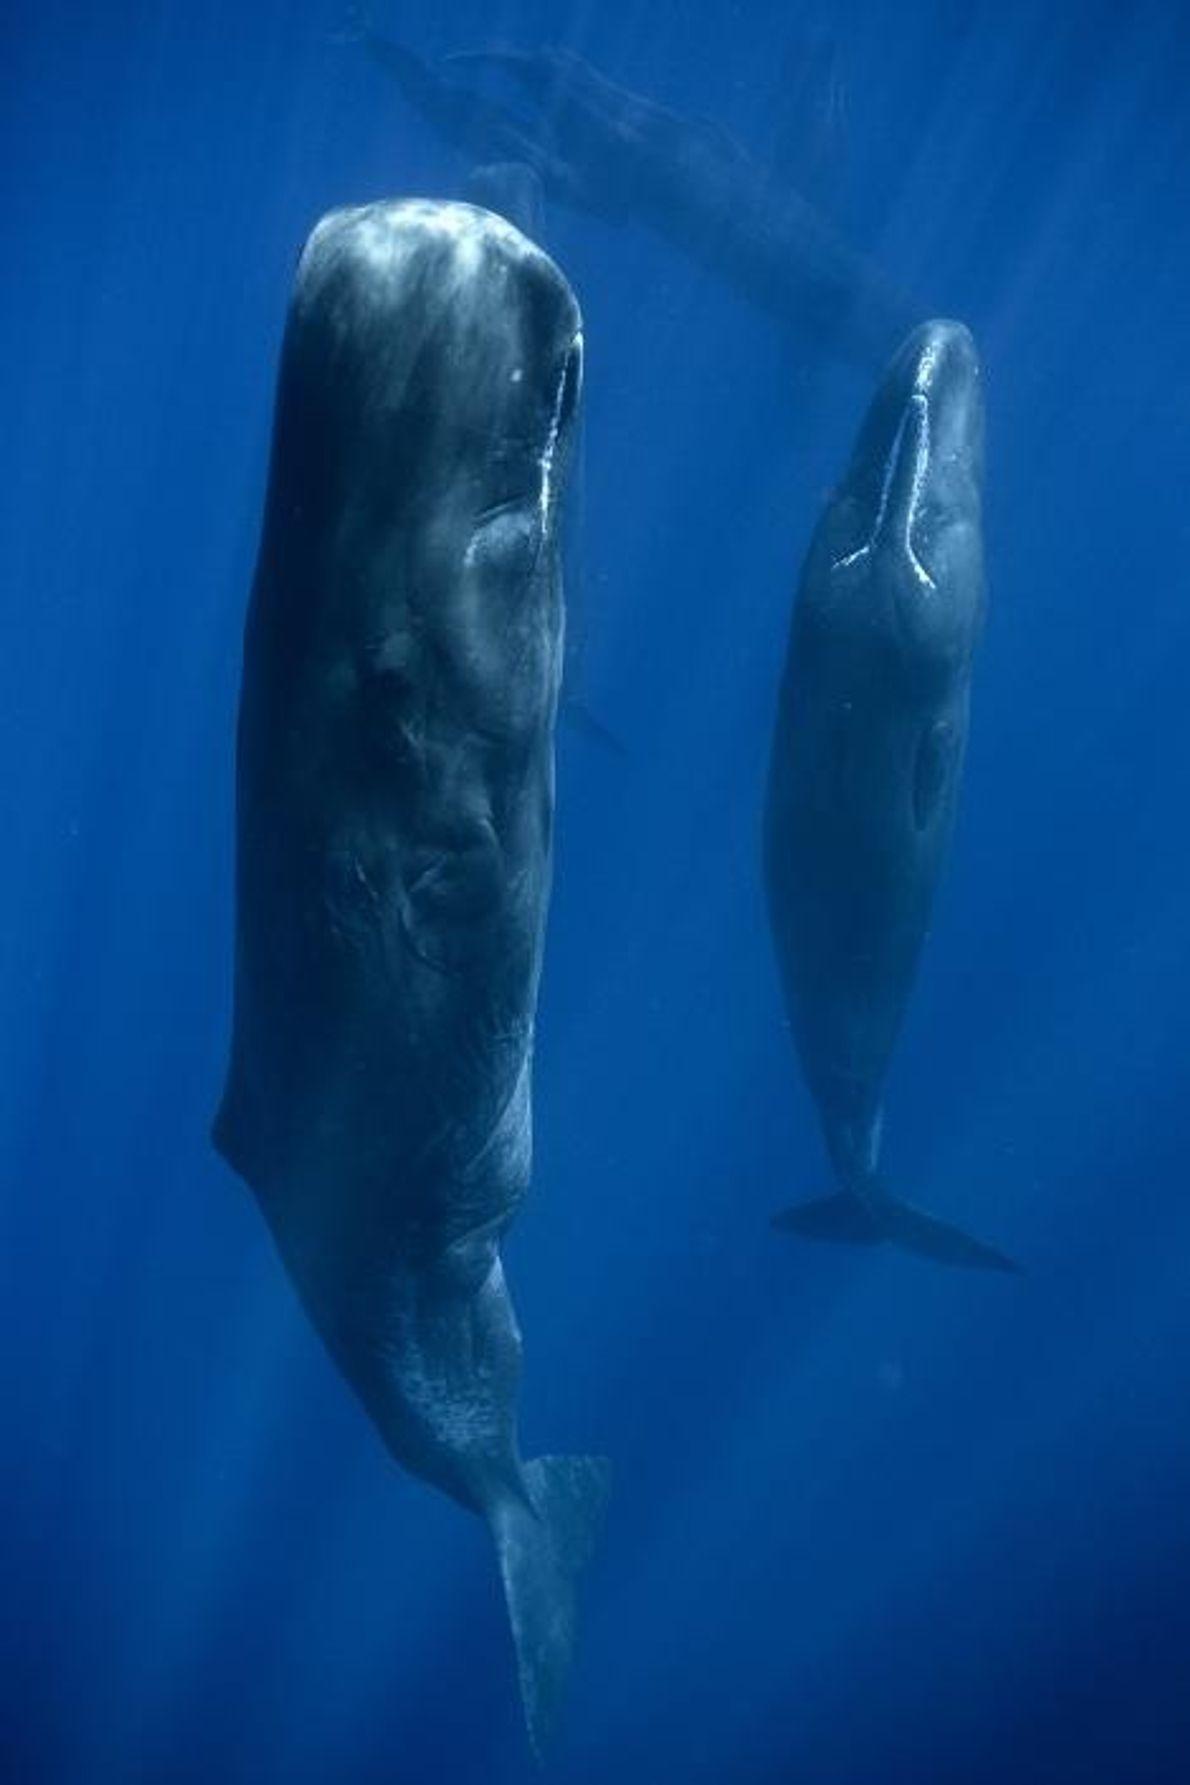 Cachalotes de cerca